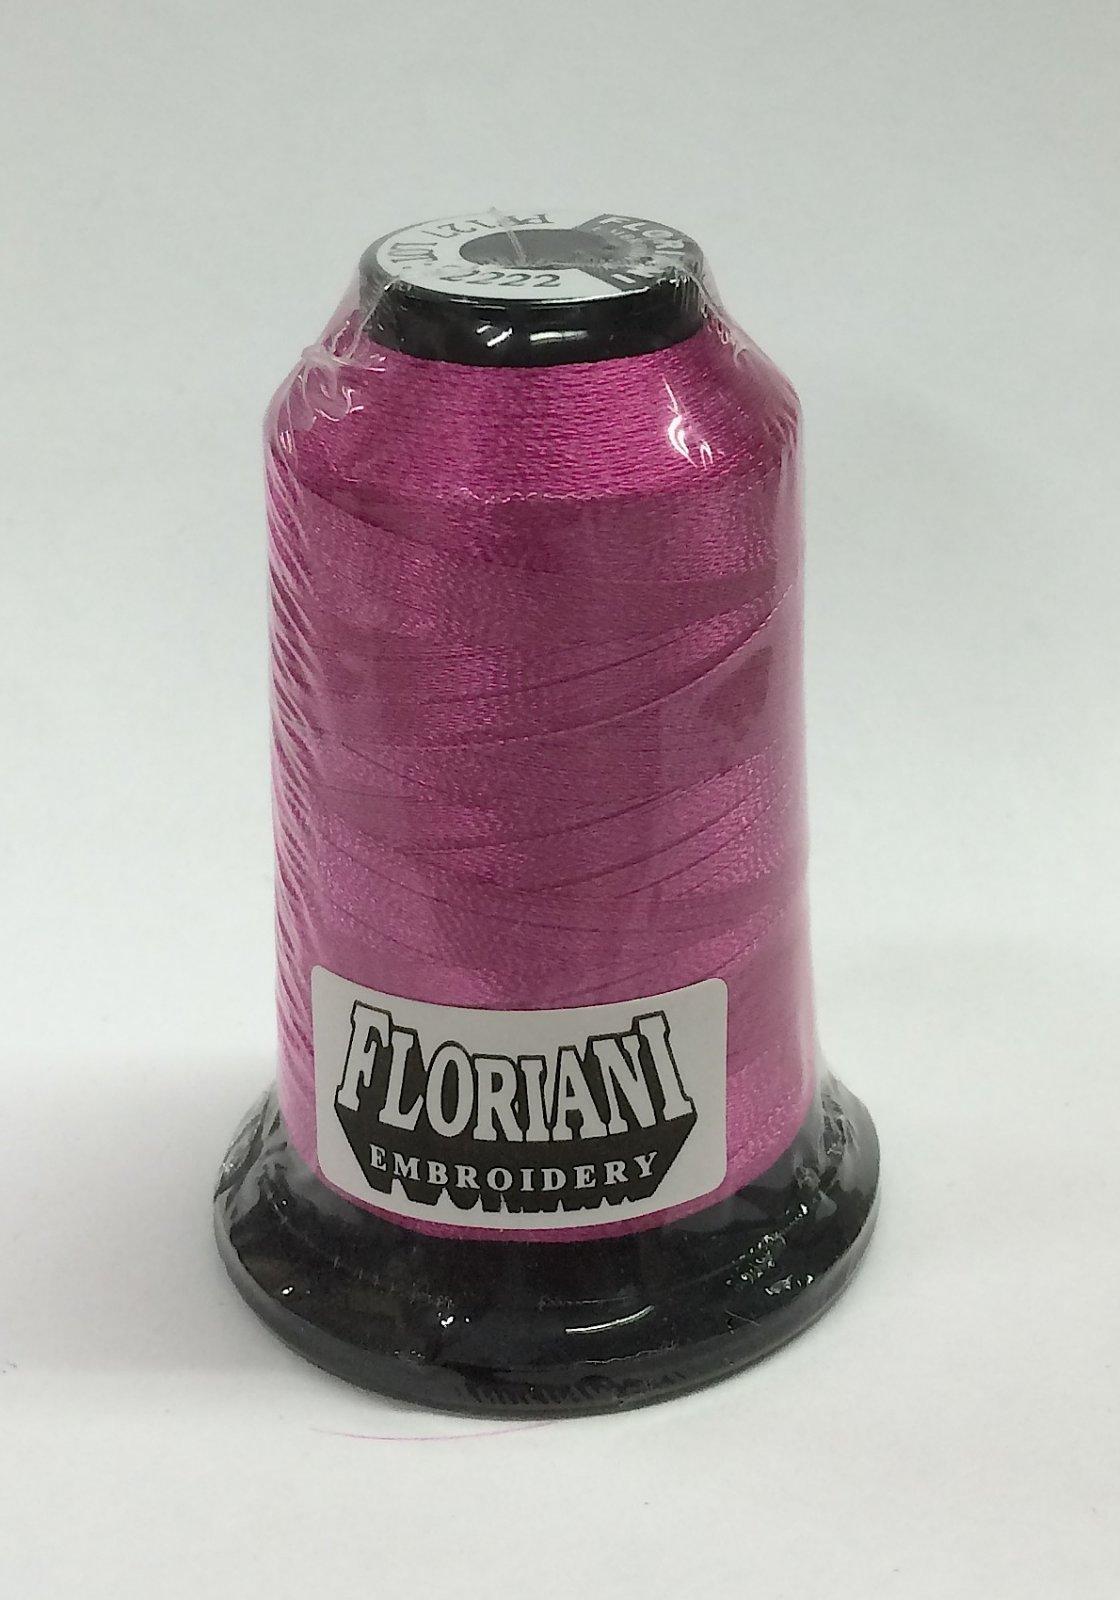 Floriani Embroidery Thread Color #0127